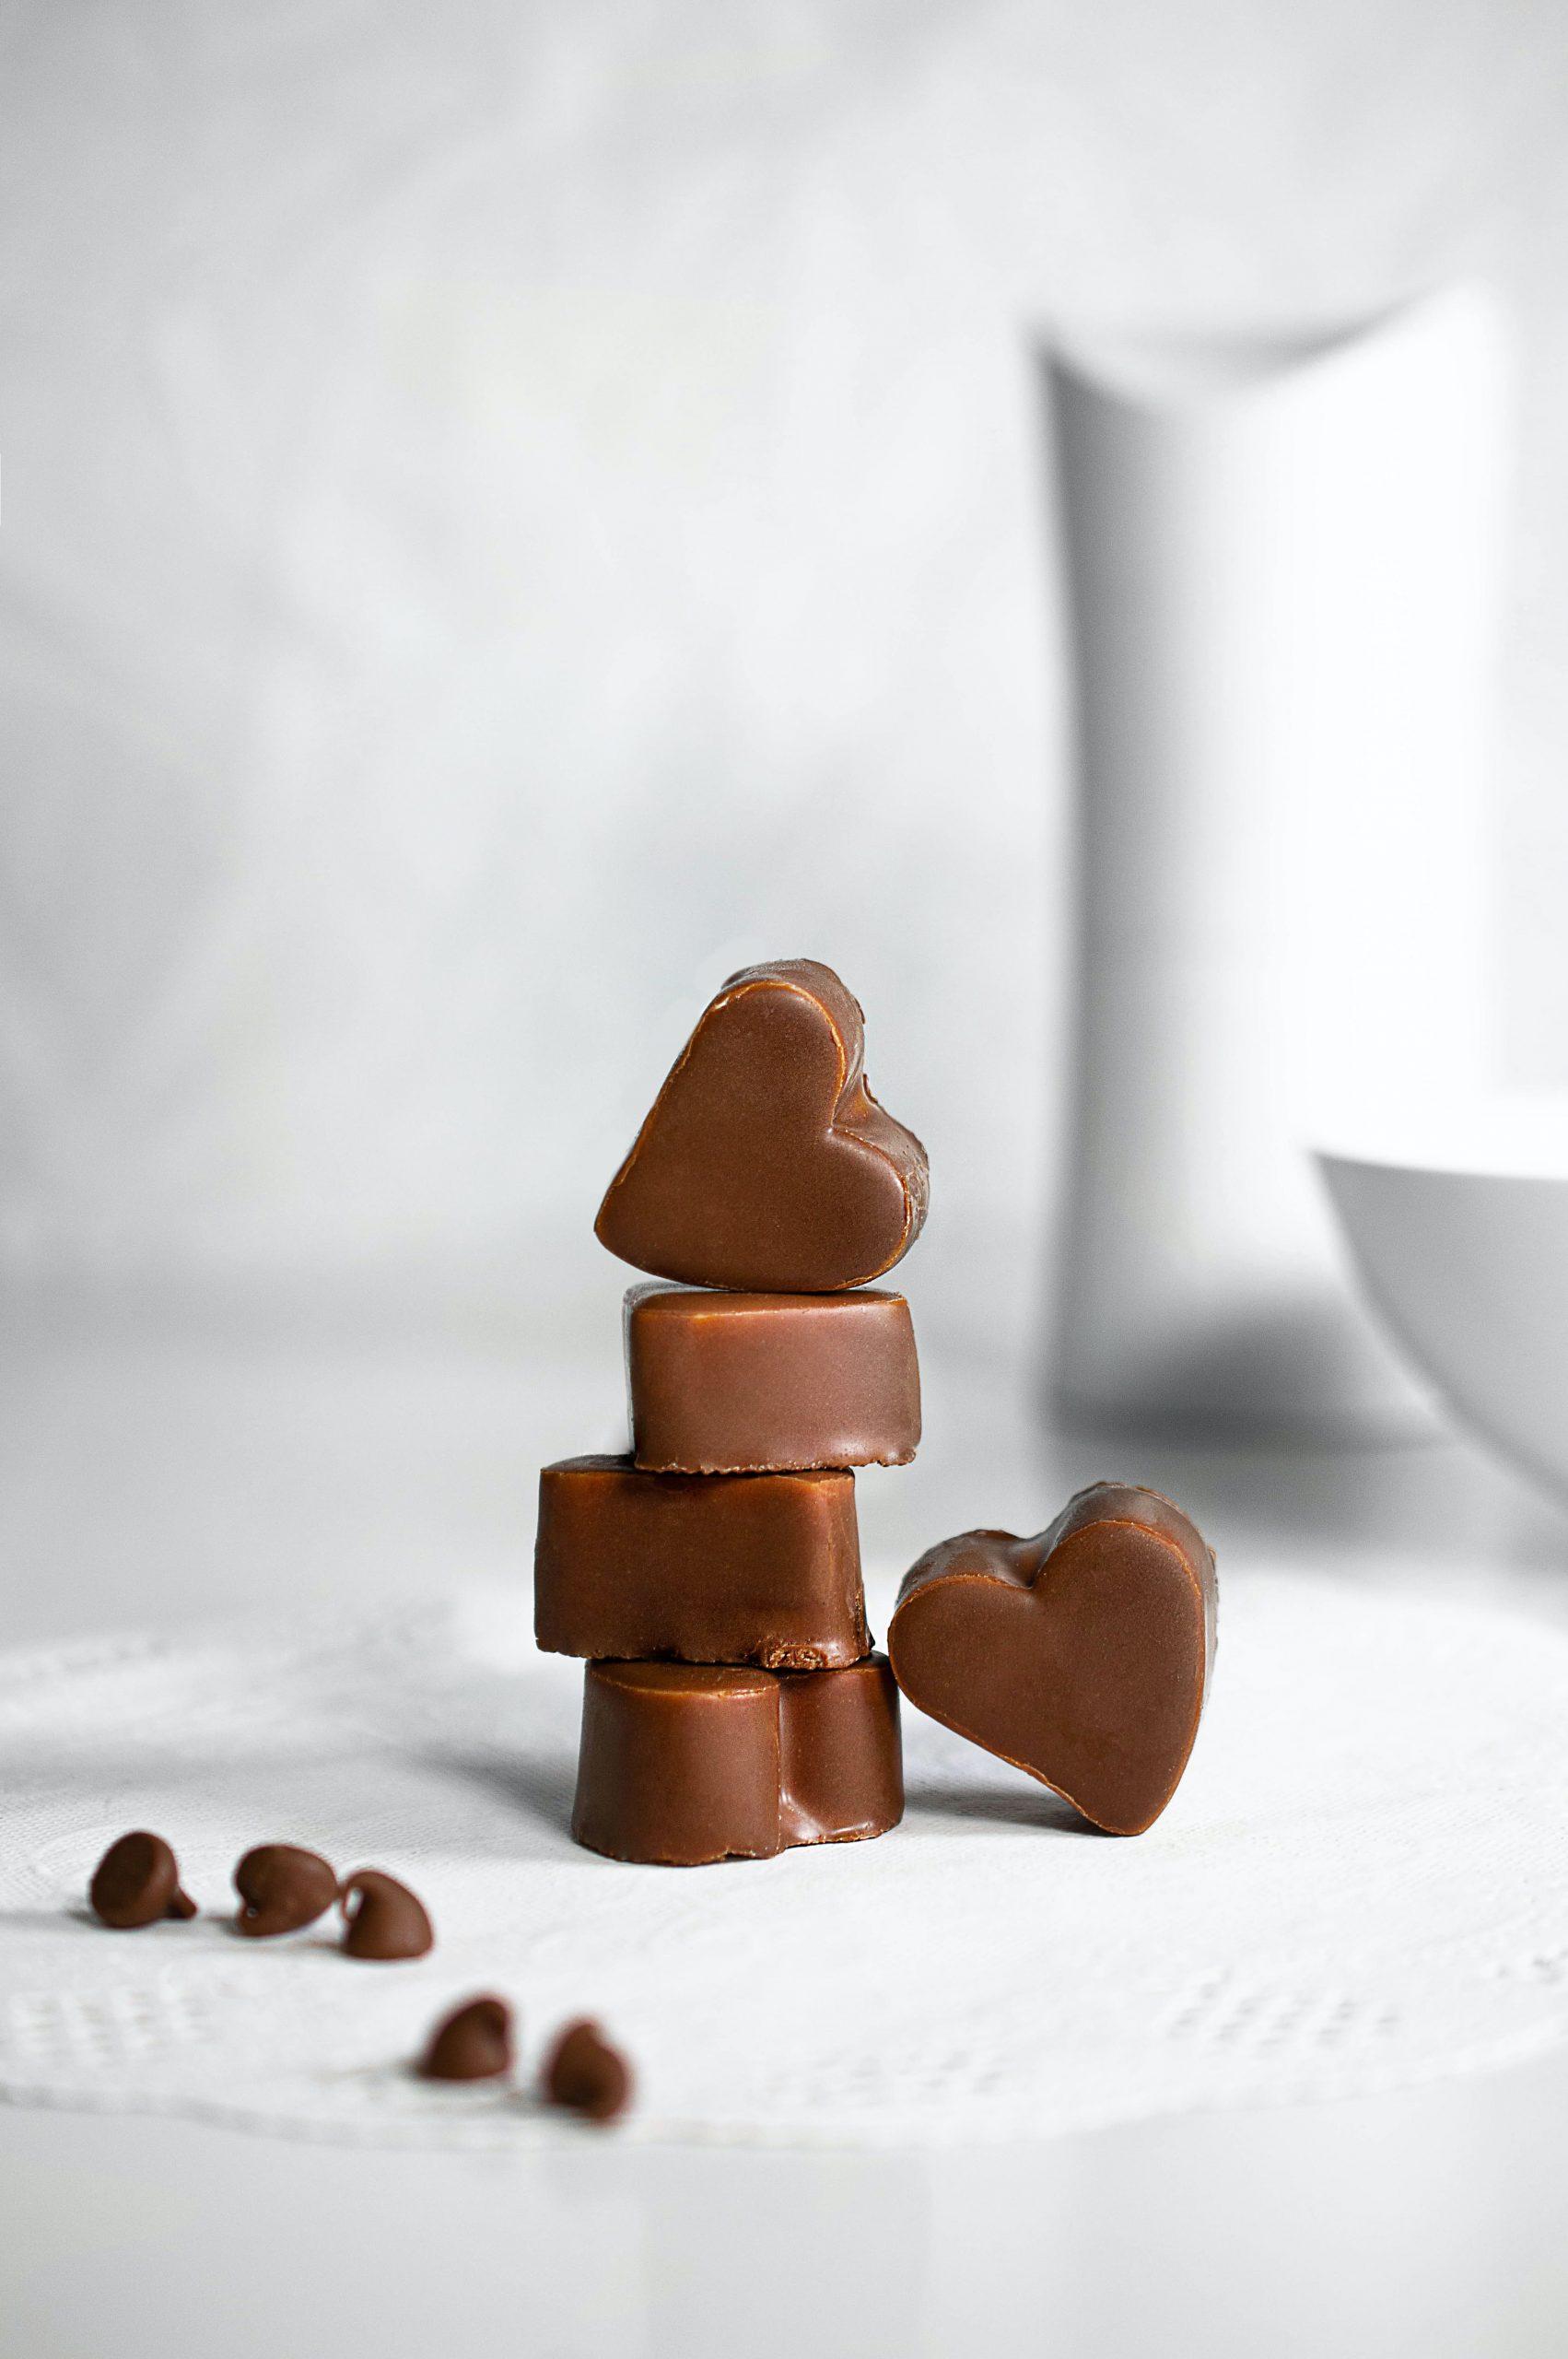 "Schokolade ohne Zucker aus dem Thermomix® - Photo by <a href=""https://unsplash.com/@saracervera?utm_source=unsplash&utm_medium=referral&utm_content=creditCopyText"">Sara Cervera</a> on <a href=""https://unsplash.com/s/photos/chocolate?utm_source=unsplash&utm_medium=referral&utm_content=creditCopyText"">Unsplash</a>"